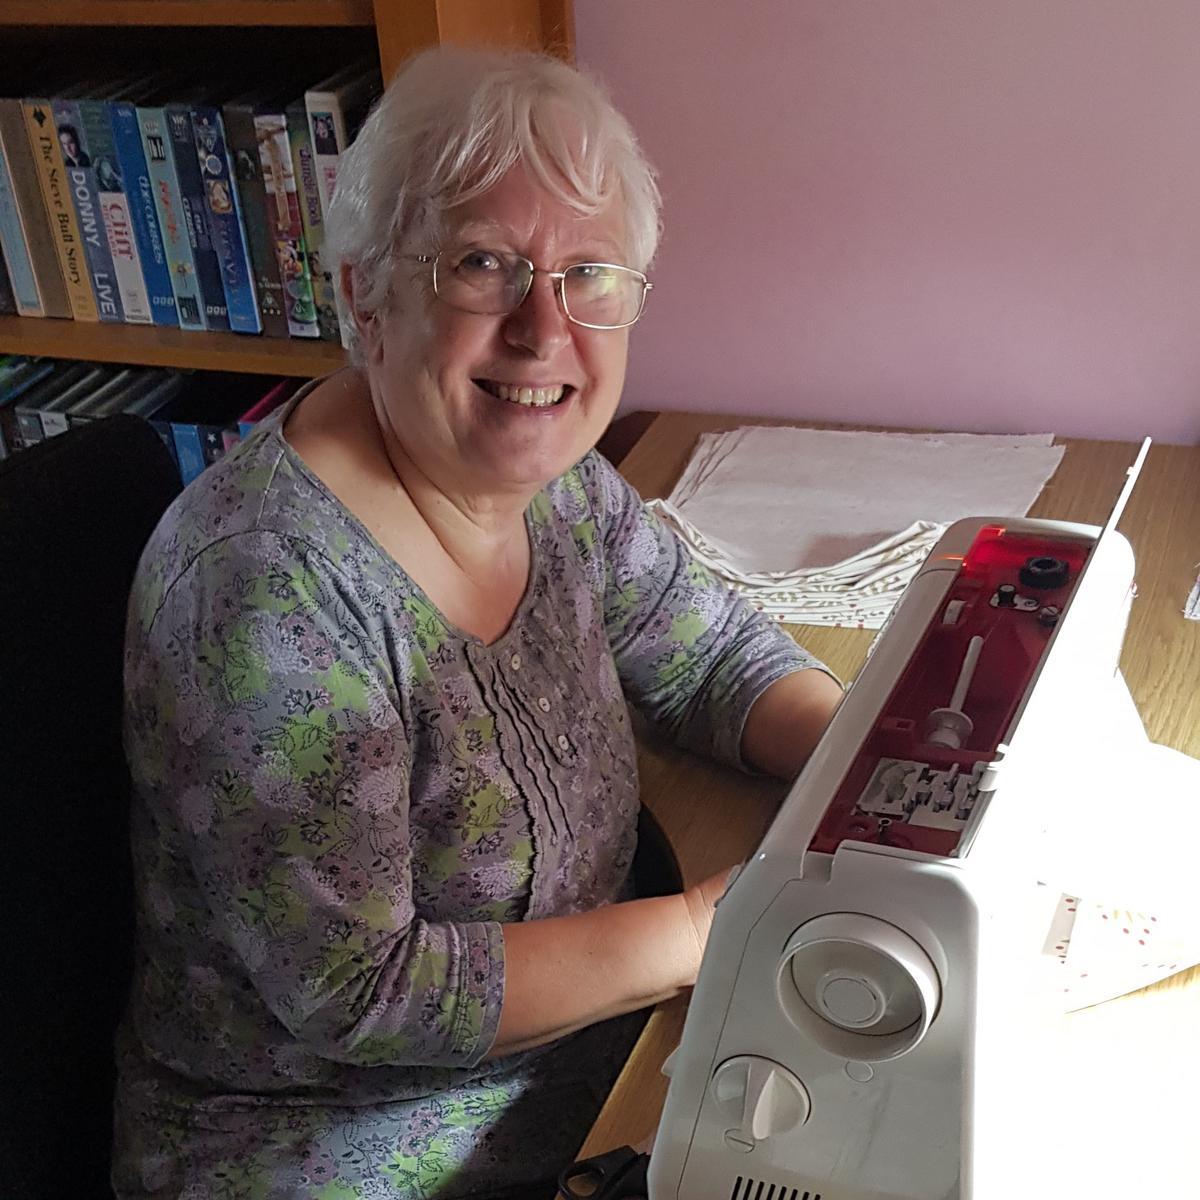 Lynn Lomax sewing on sewing machine